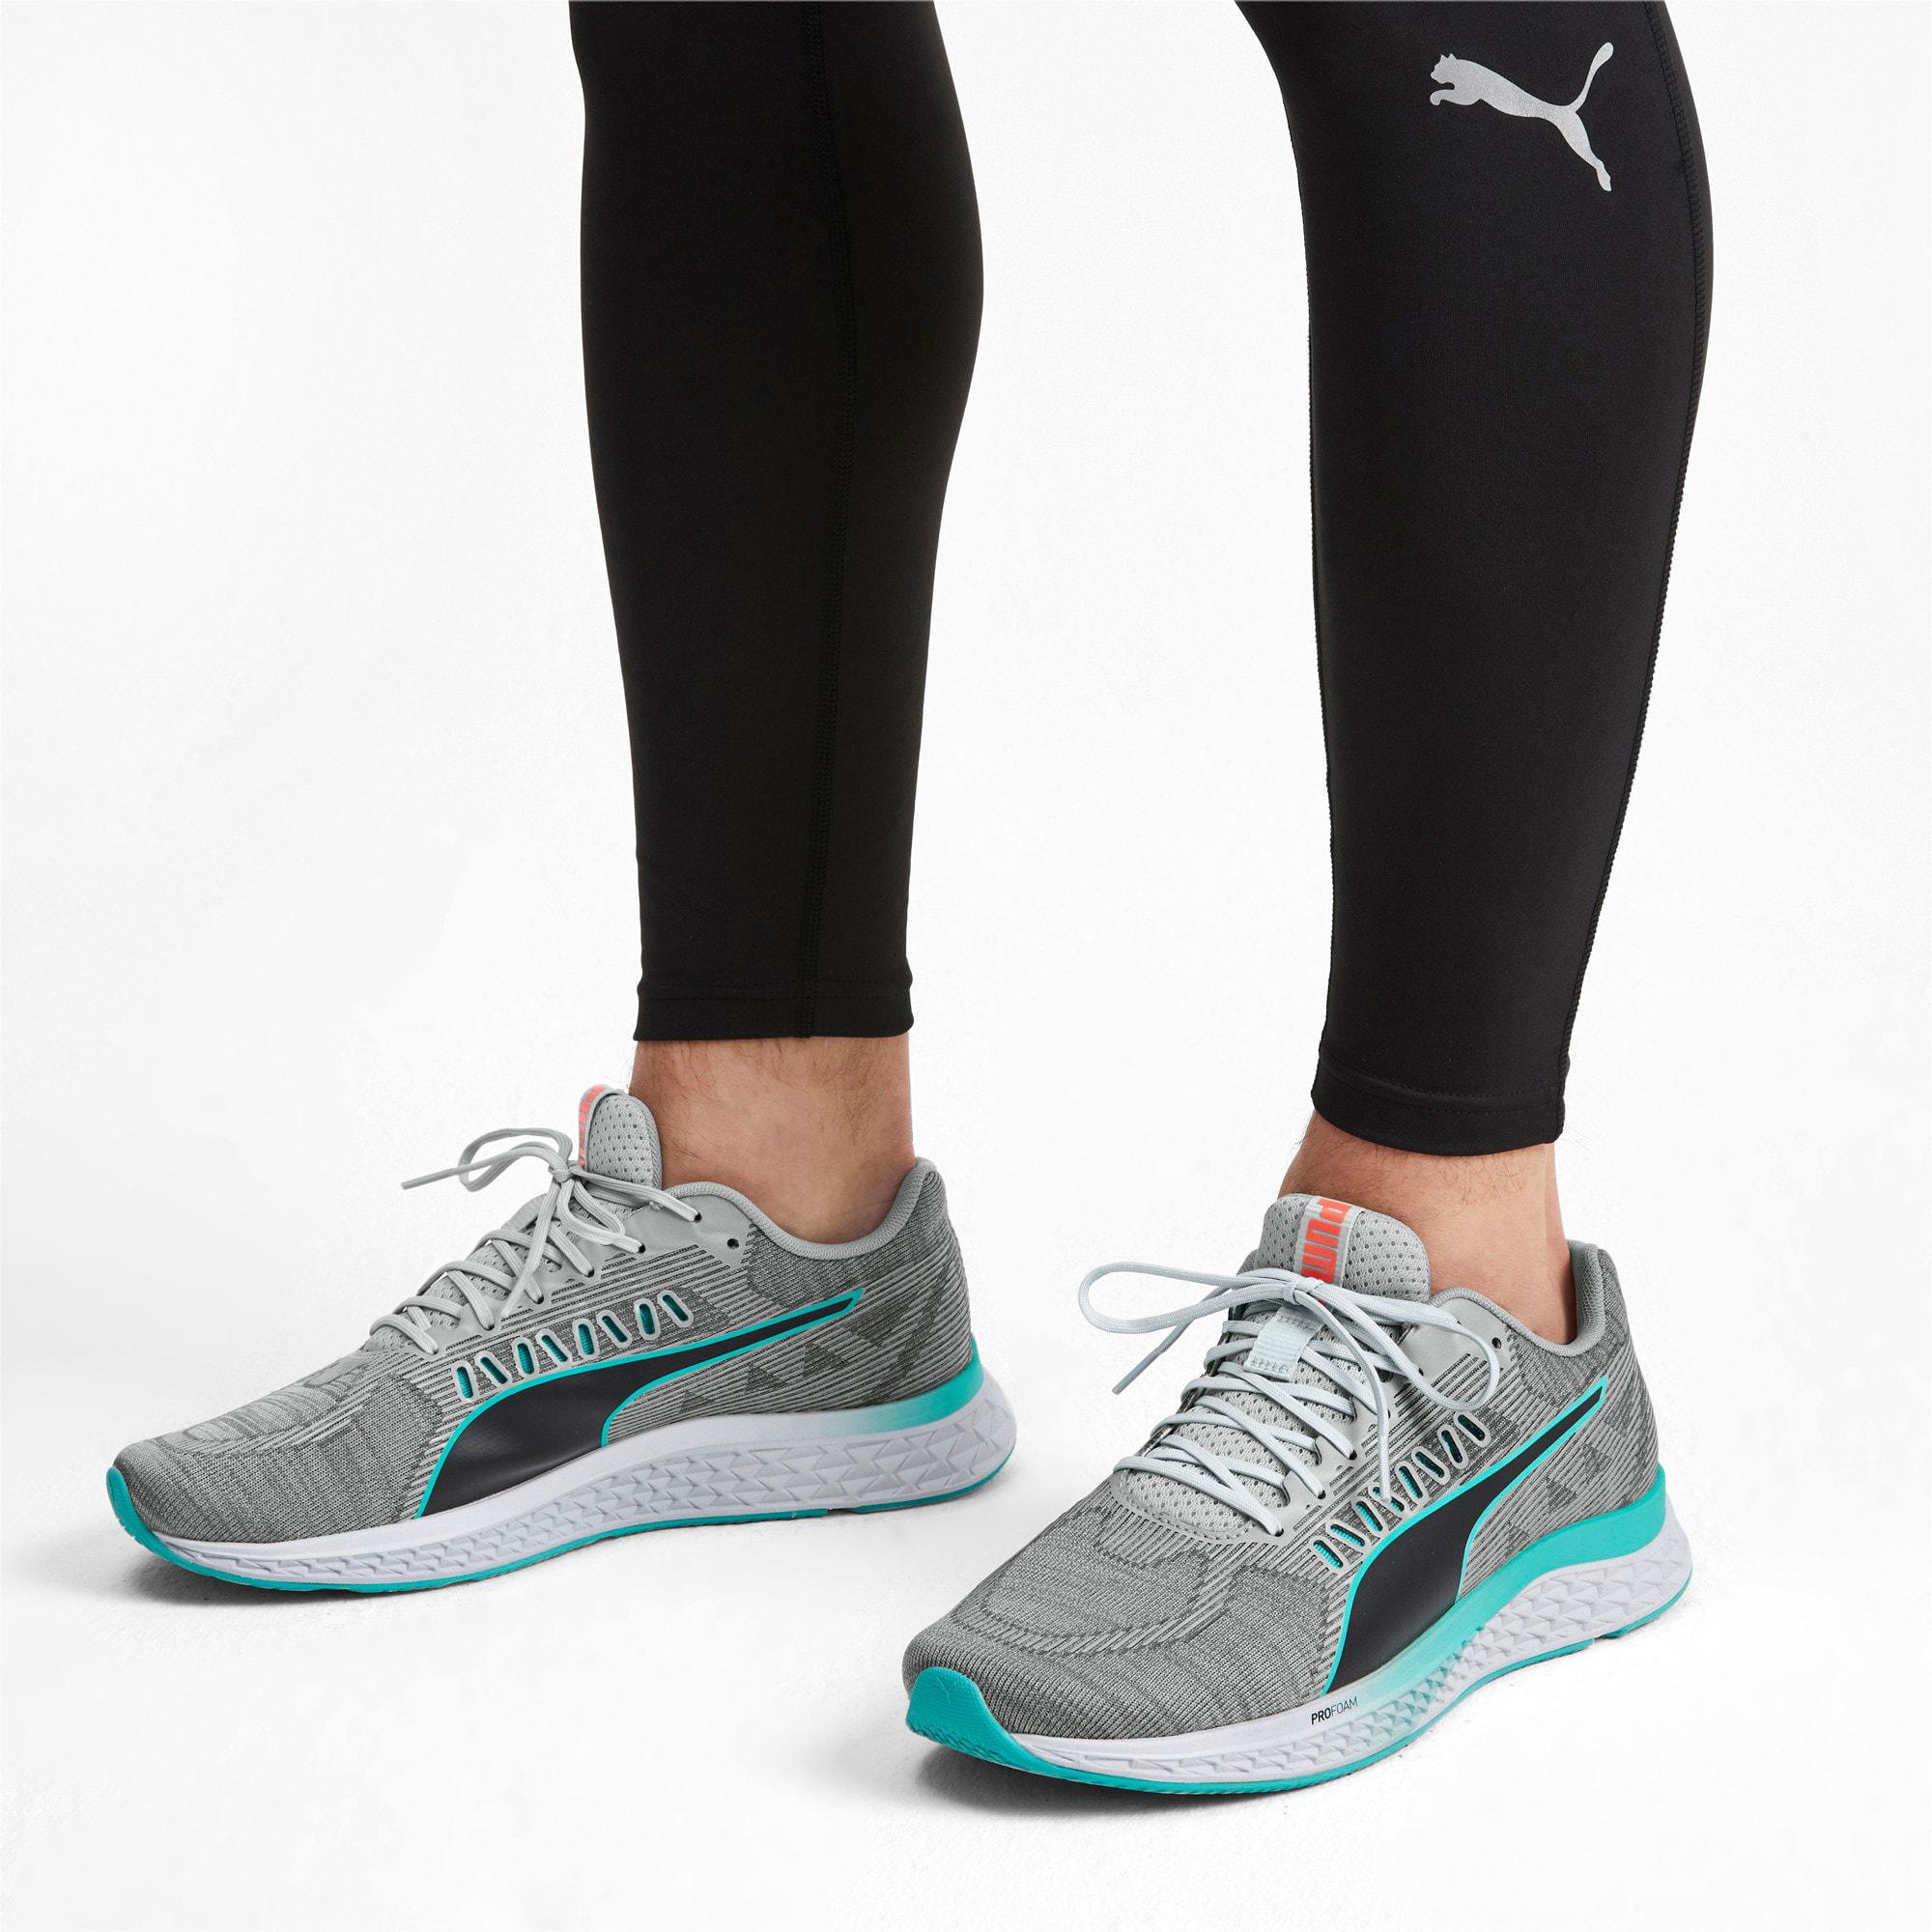 Thumbnail 2 of SPEED Sutamina Running Shoes, High Rise-Nrgy Red-Blue Turq, medium